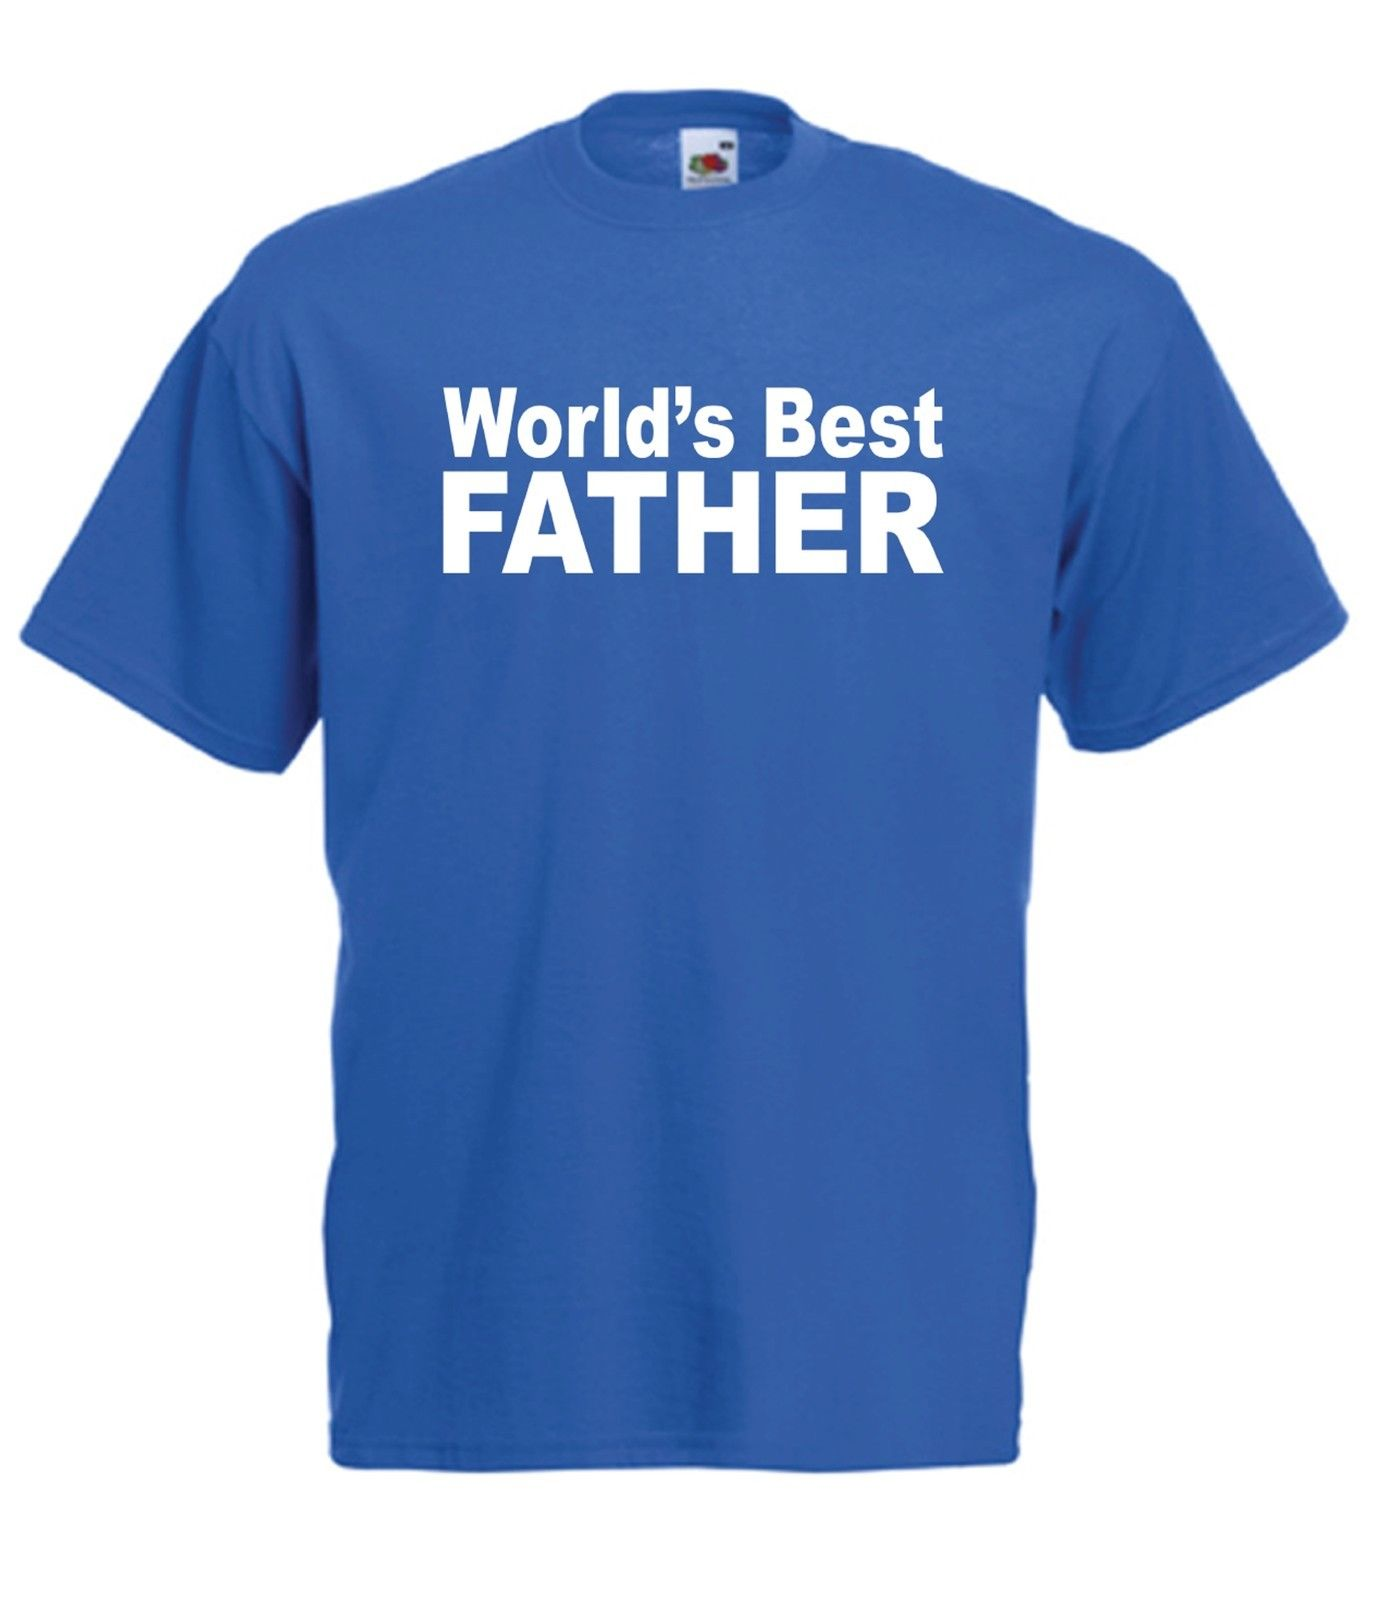 WORLDS BEST FATHER Grandad Dads Christmas Birthday Gift Idea Mens Womens T SHIRT  2018 New Short Sleeve Casual T-Shirt Tee